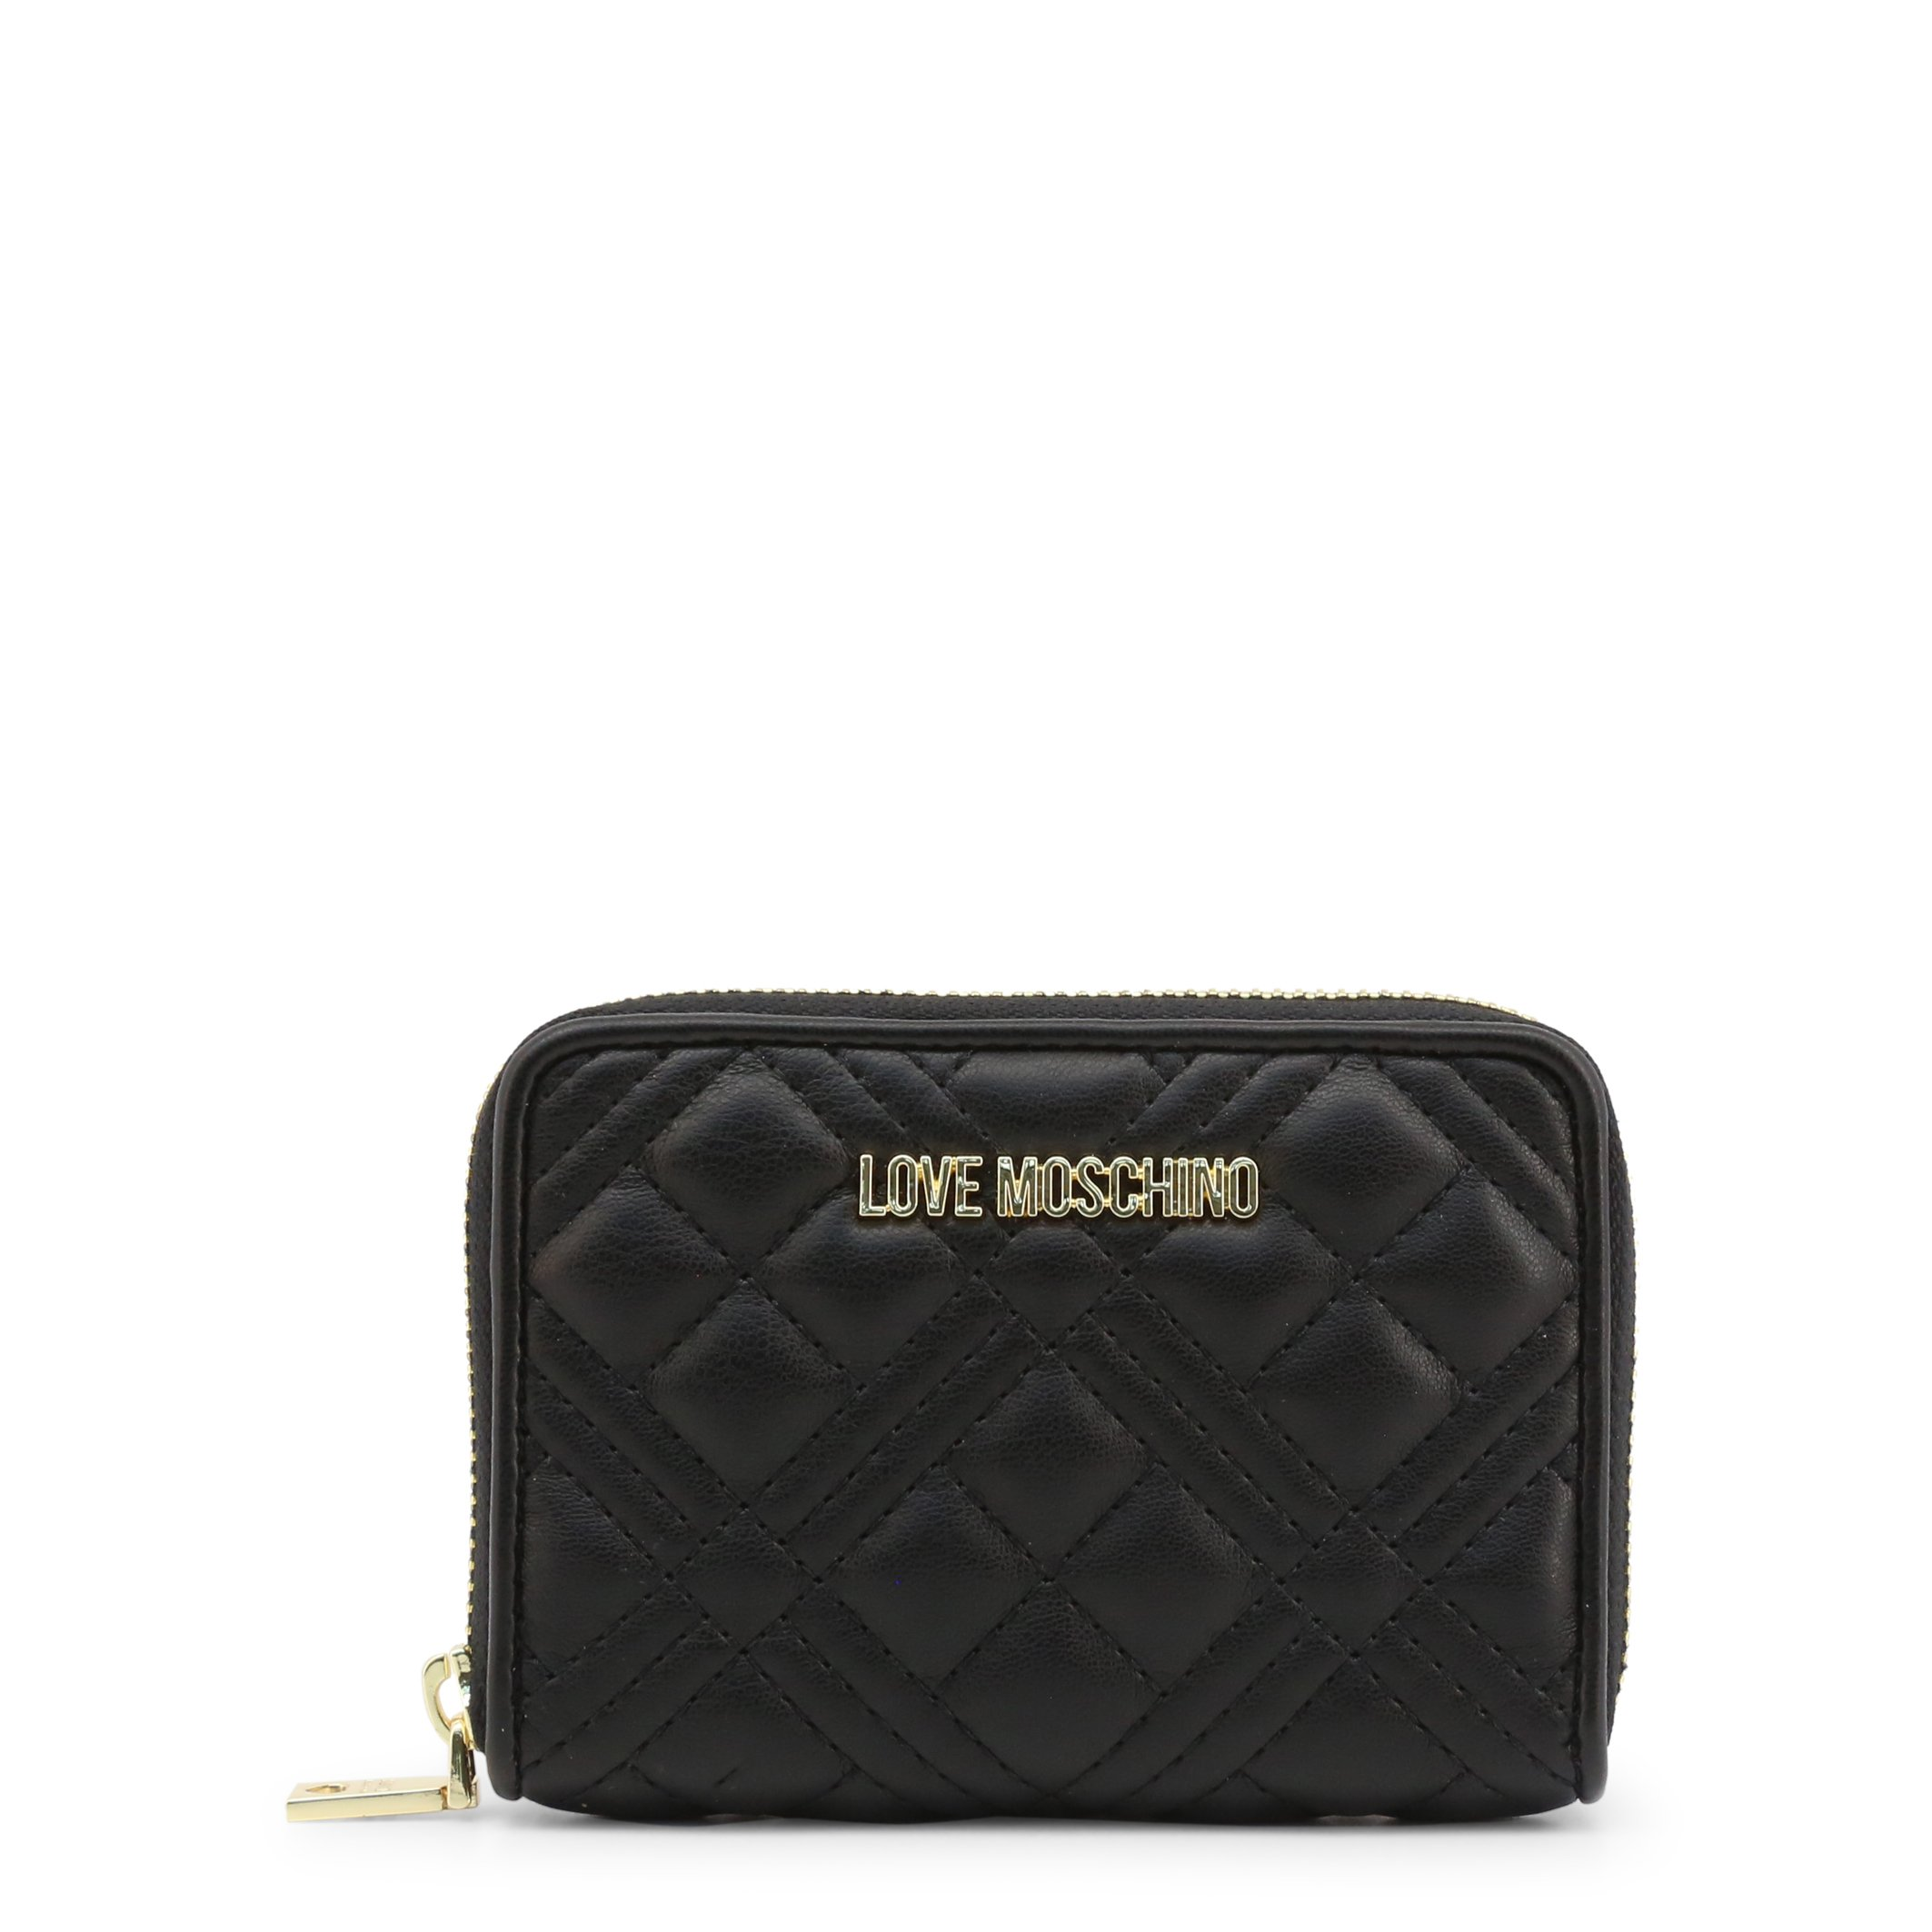 Love Moschino Women's Wallet Various Colours JC5602PP1CLA0 - black NOSIZE